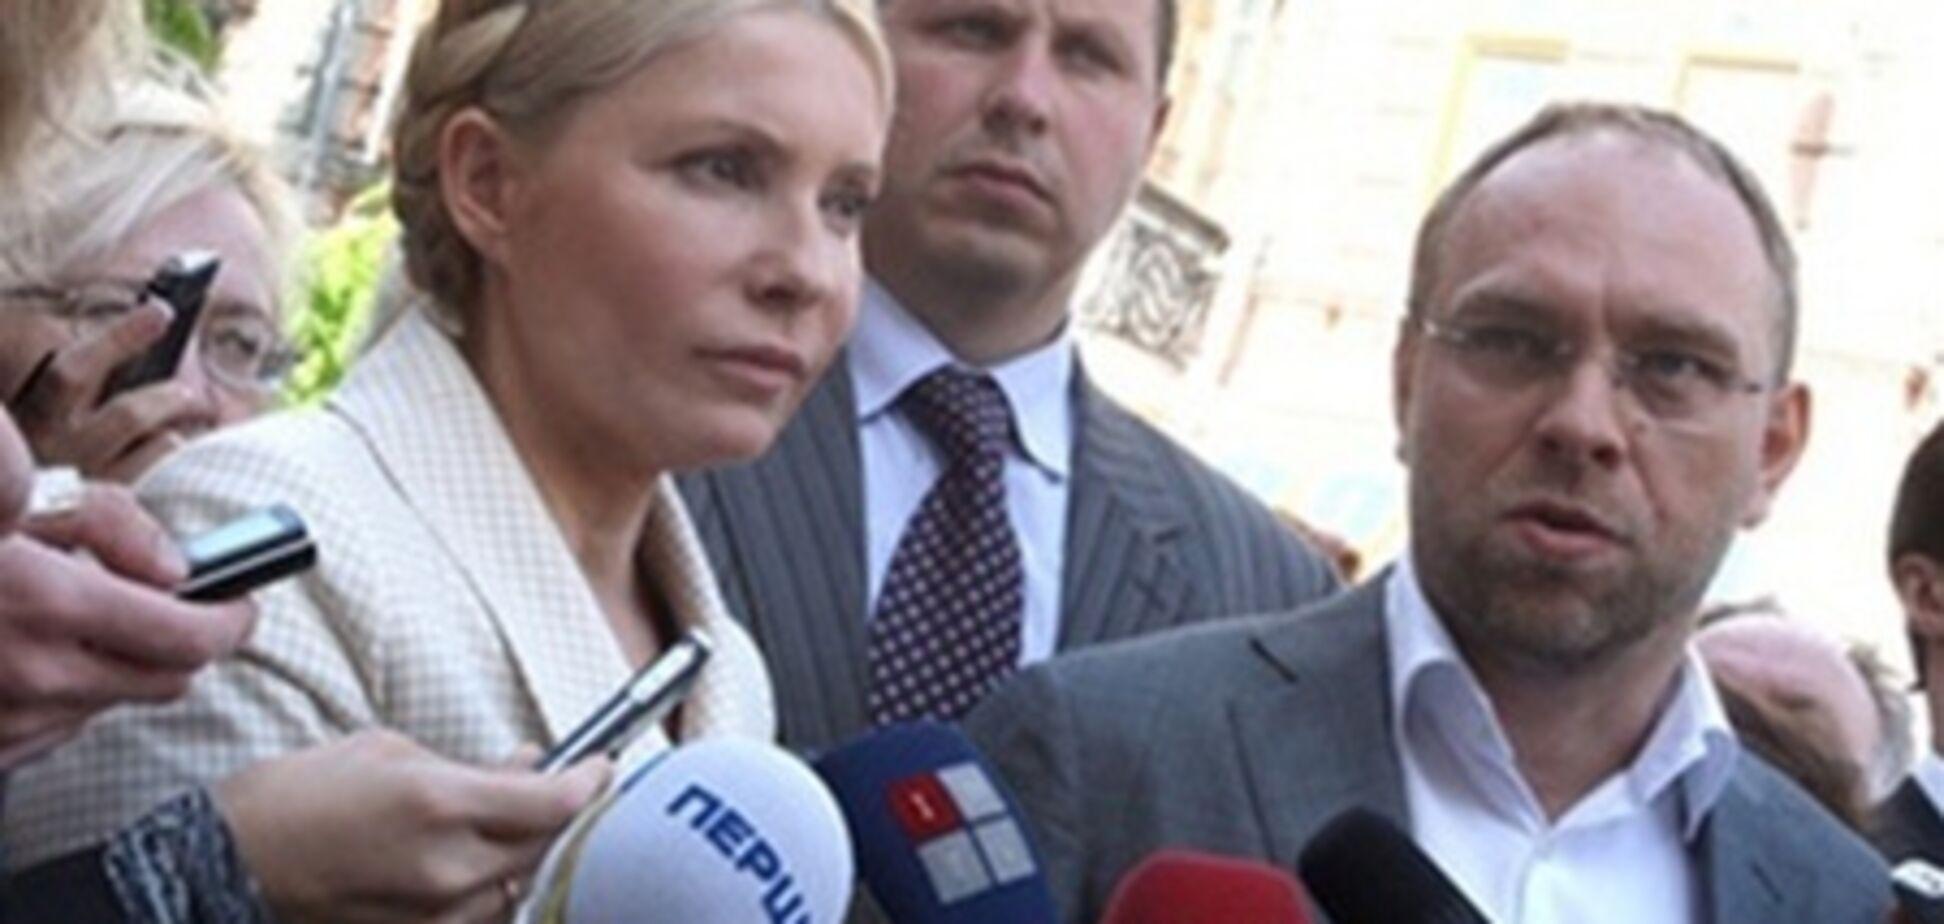 Экс-министр промполитики дал показания против Тимошенко